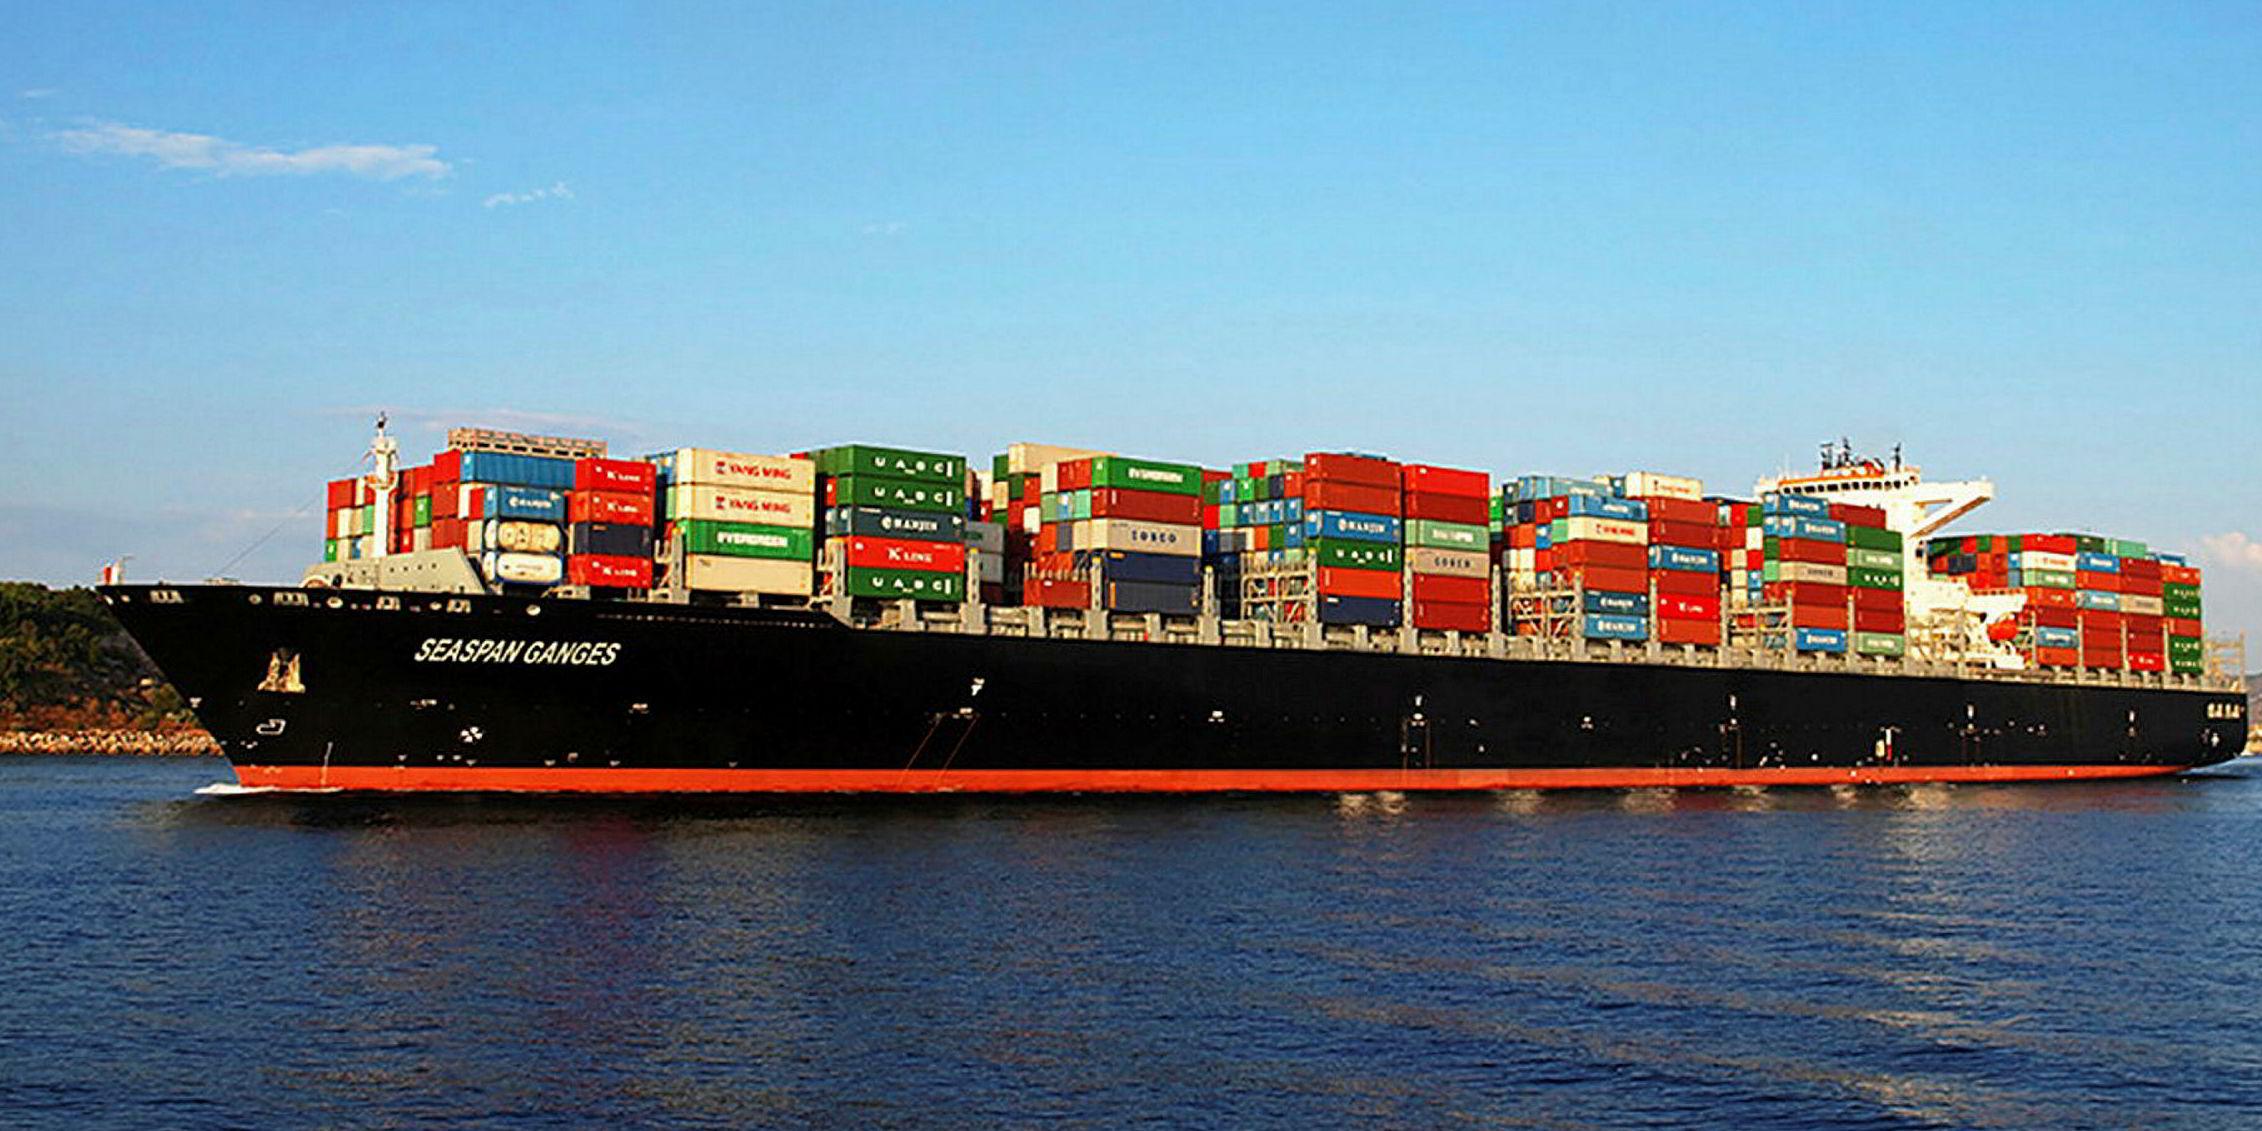 beste Wahl bester Service großer Lagerverkauf Hapag-Lloyd charter spree cheers up major owners | TradeWinds